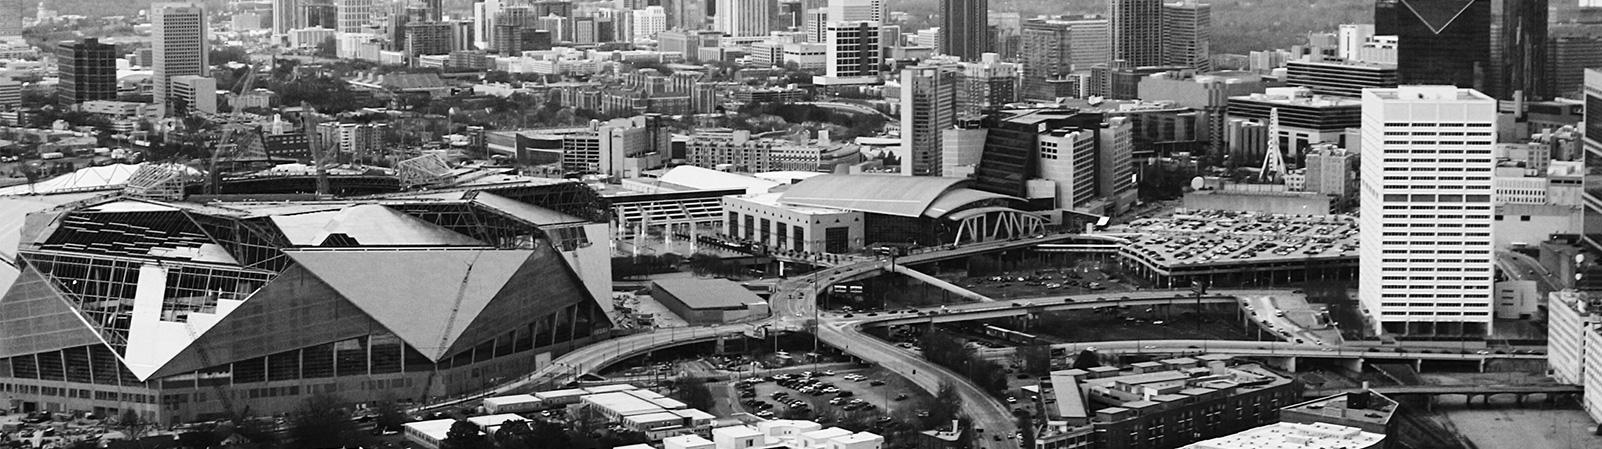 Image of Atlanta city showing Mercedes Benz stadium in construction